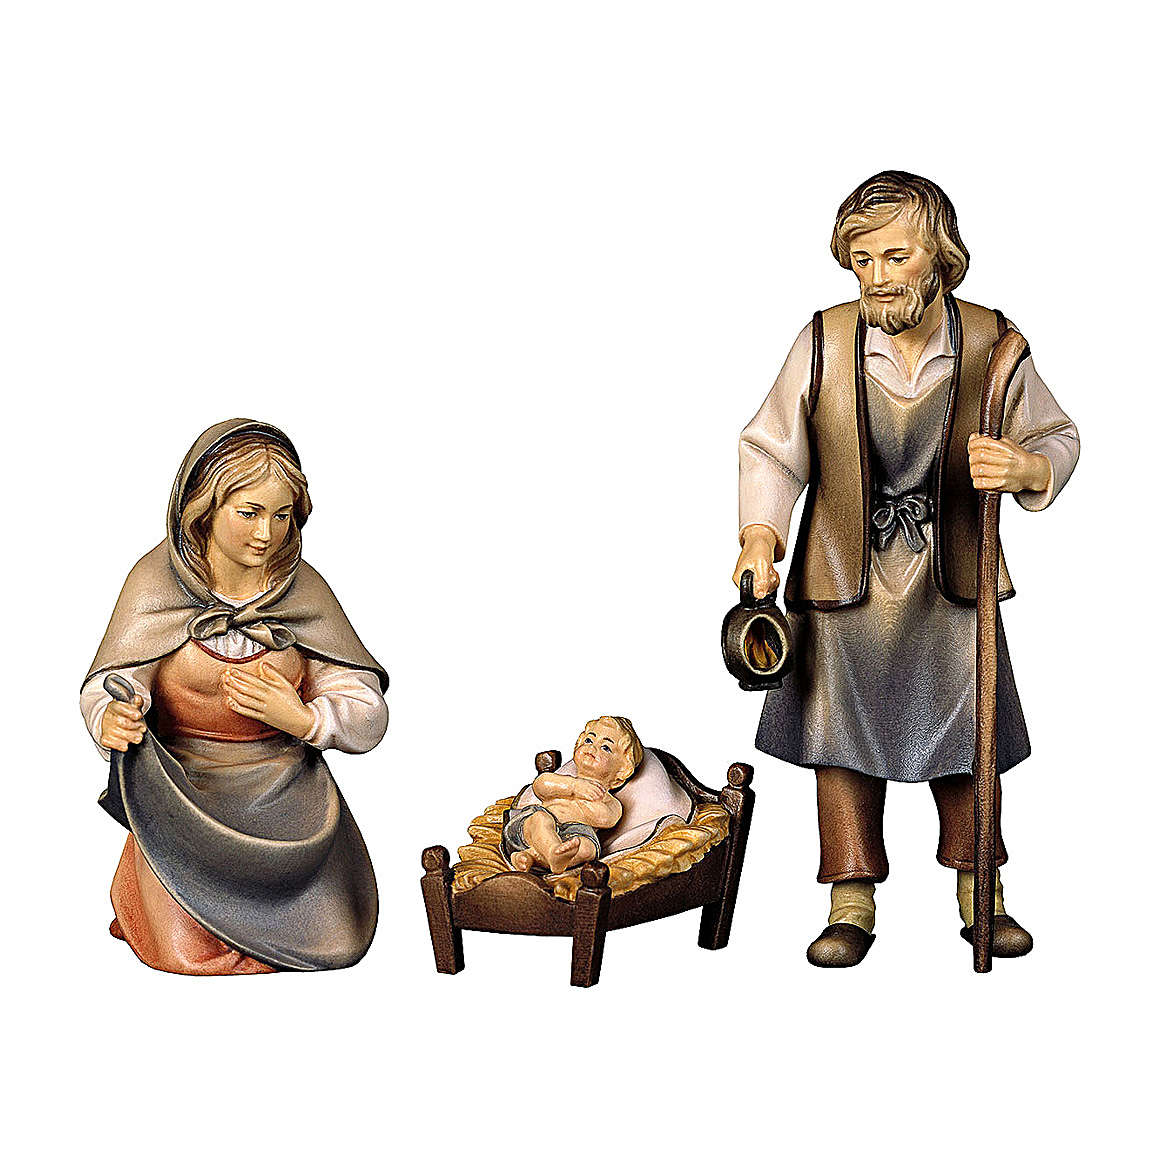 Sacra famiglia presepe Original Pastore legno dipinto in Val Gardena 12 cm 4